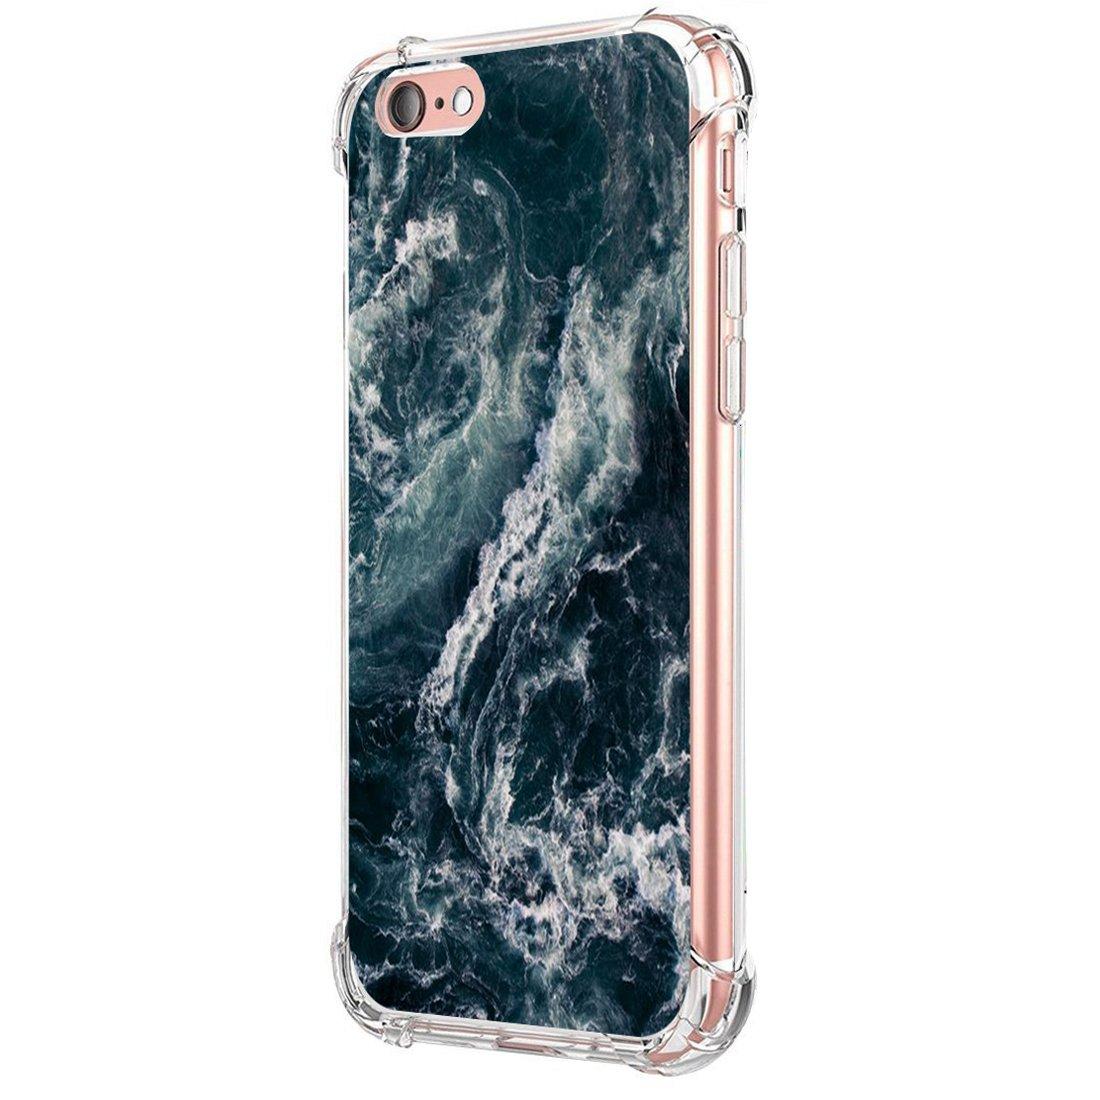 iPhone 6//6S Plus, m/ármol 04 JEPER Funda iPhone 6S Plus Carcasa Silicona Transparente Protector TPU Airbag Anti-Choque Ultra-Delgado Anti-ara/ñazos M/ármol Case para Apple iPhone 6 Plus Caso Caja